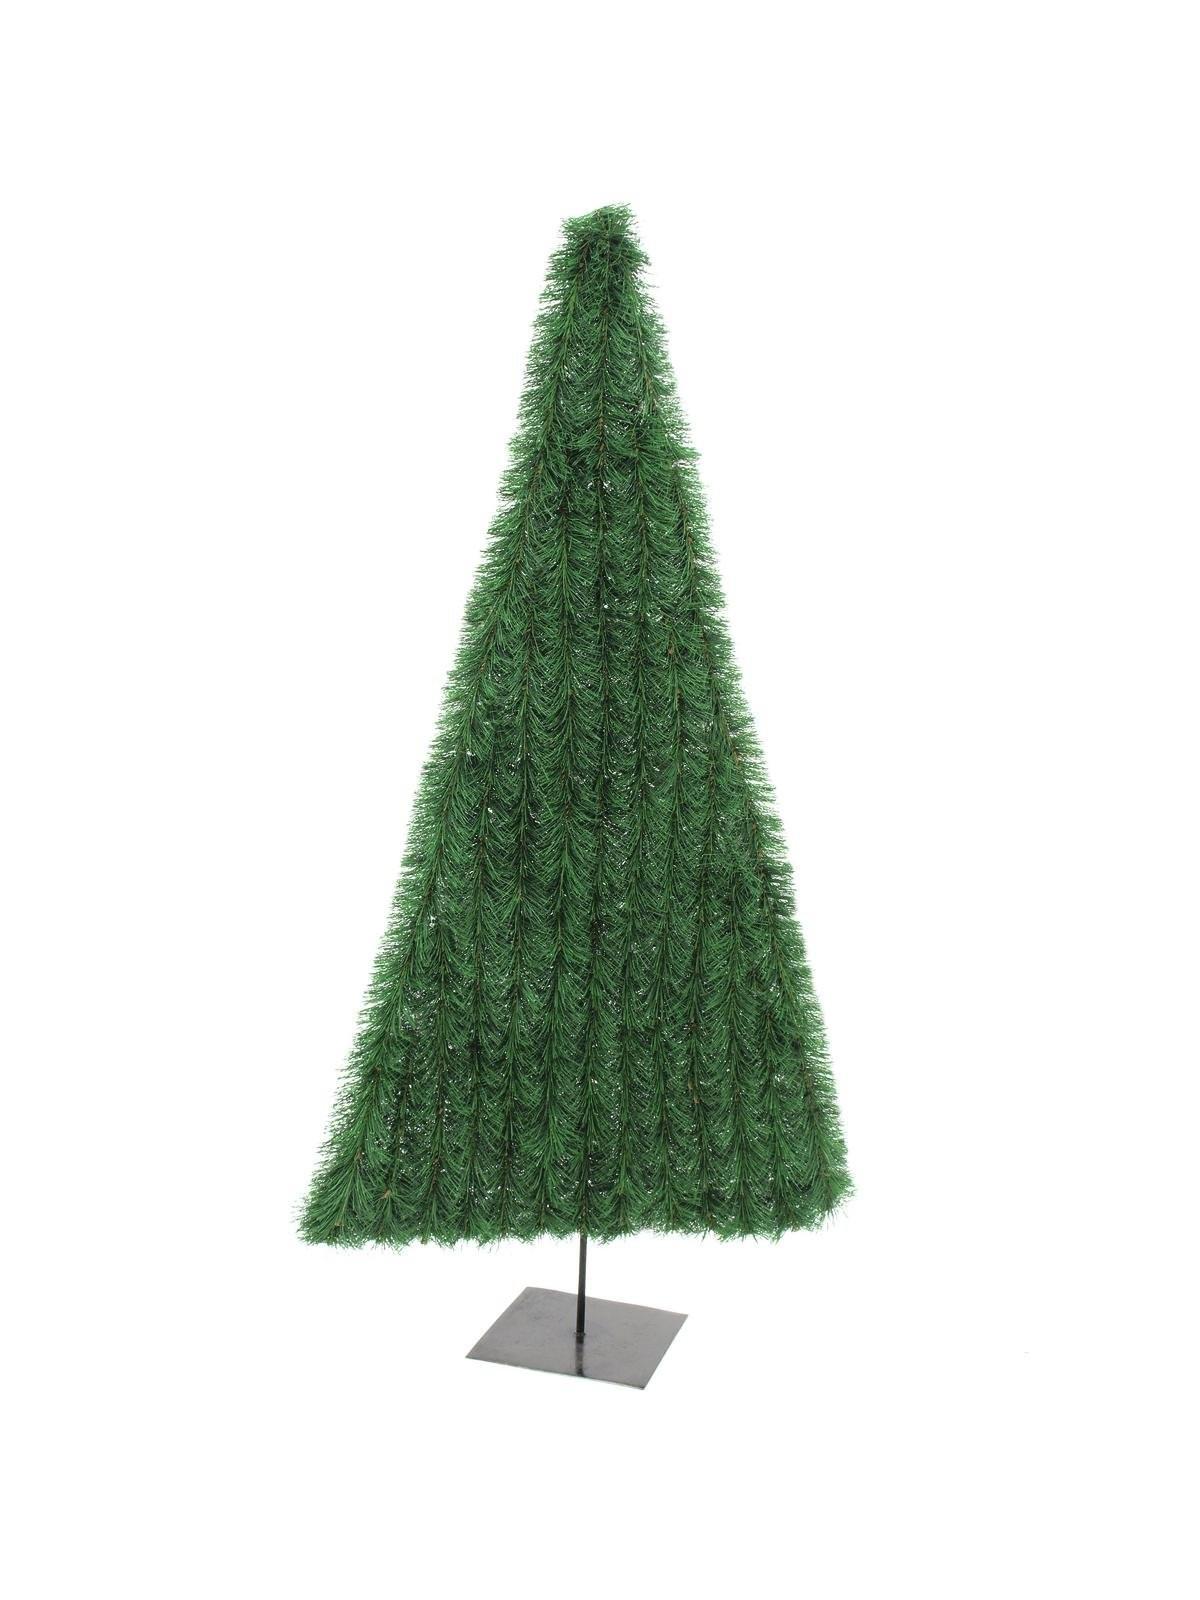 Kerstboom plat, donker groen, 180cm